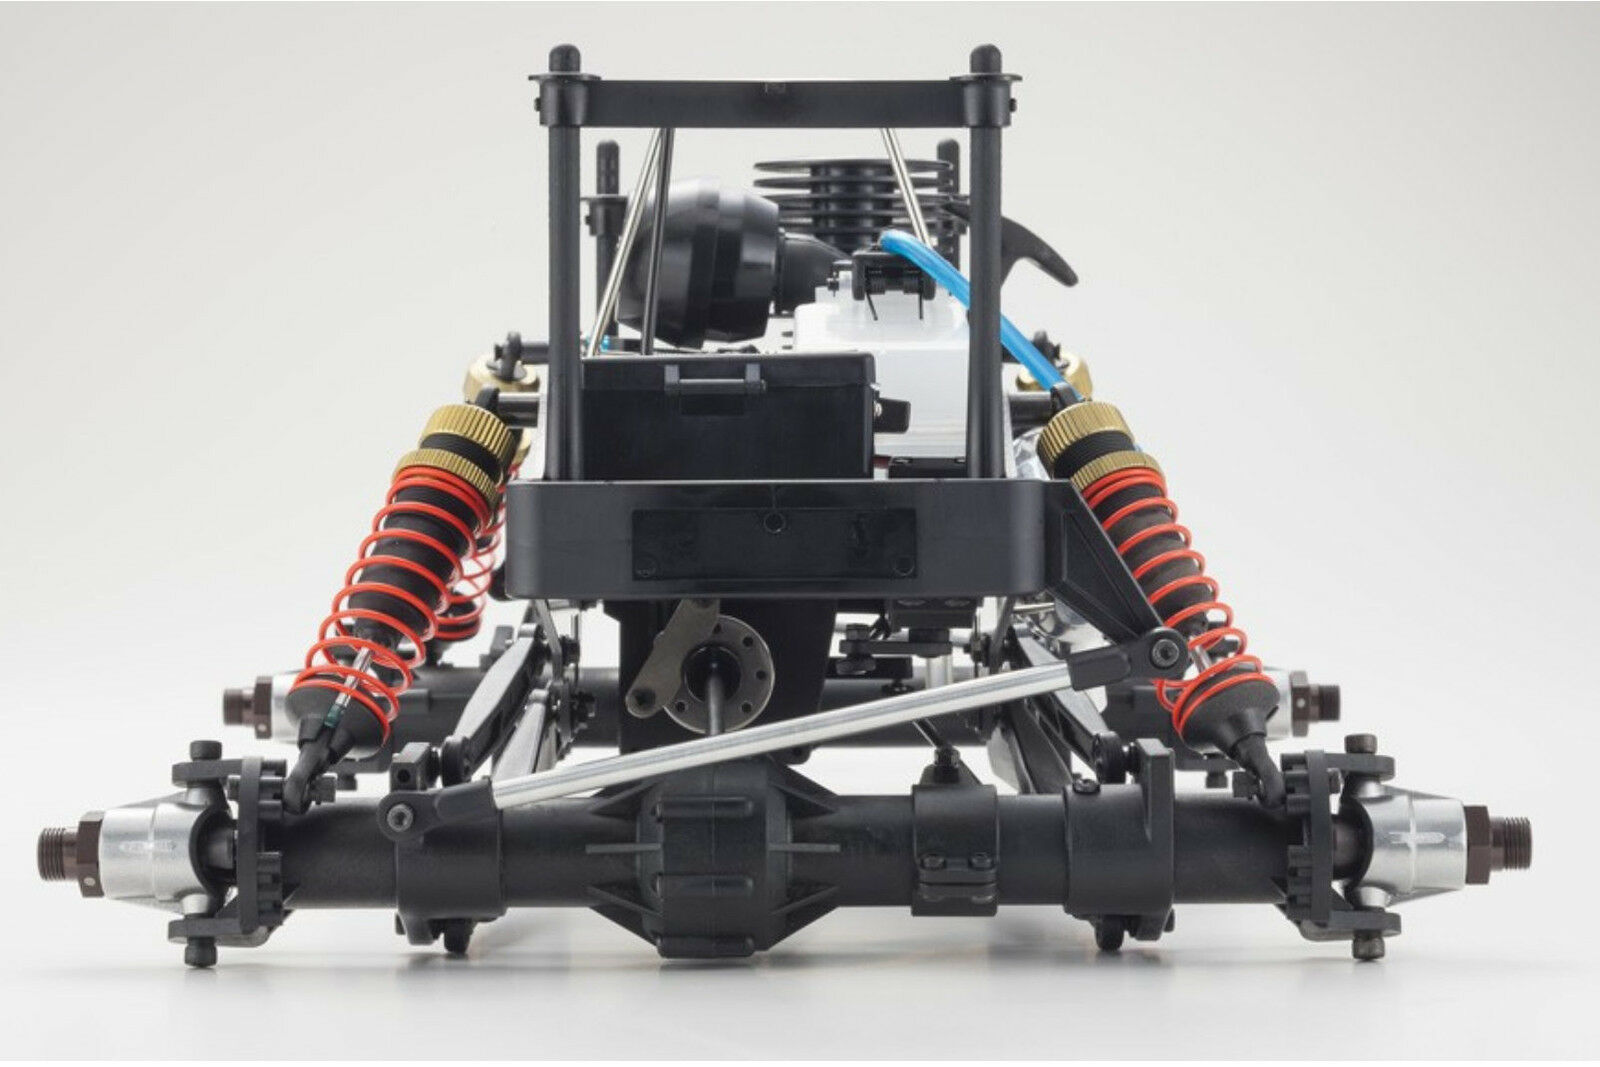 Kyosho 33152 Mad Crusher Crusher Crusher Nitro 1-8 GP 4WD RTR KT231P-KE25 4025d0